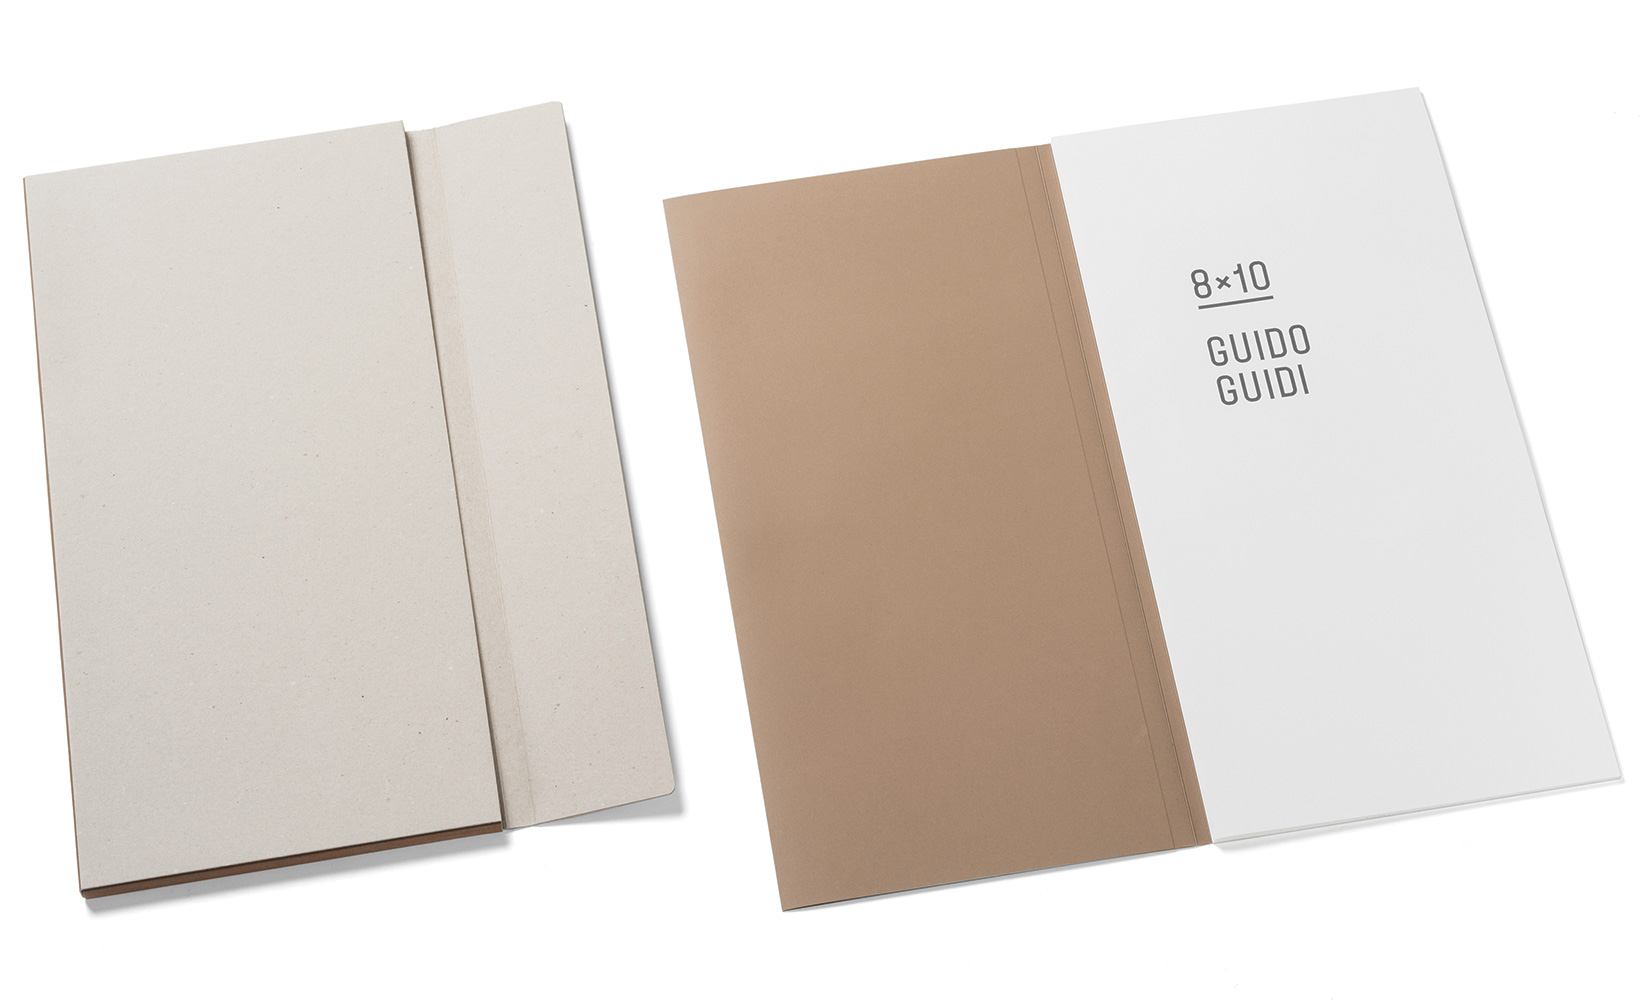 olivier-andreotti-guido-GUIDI-03.jpg